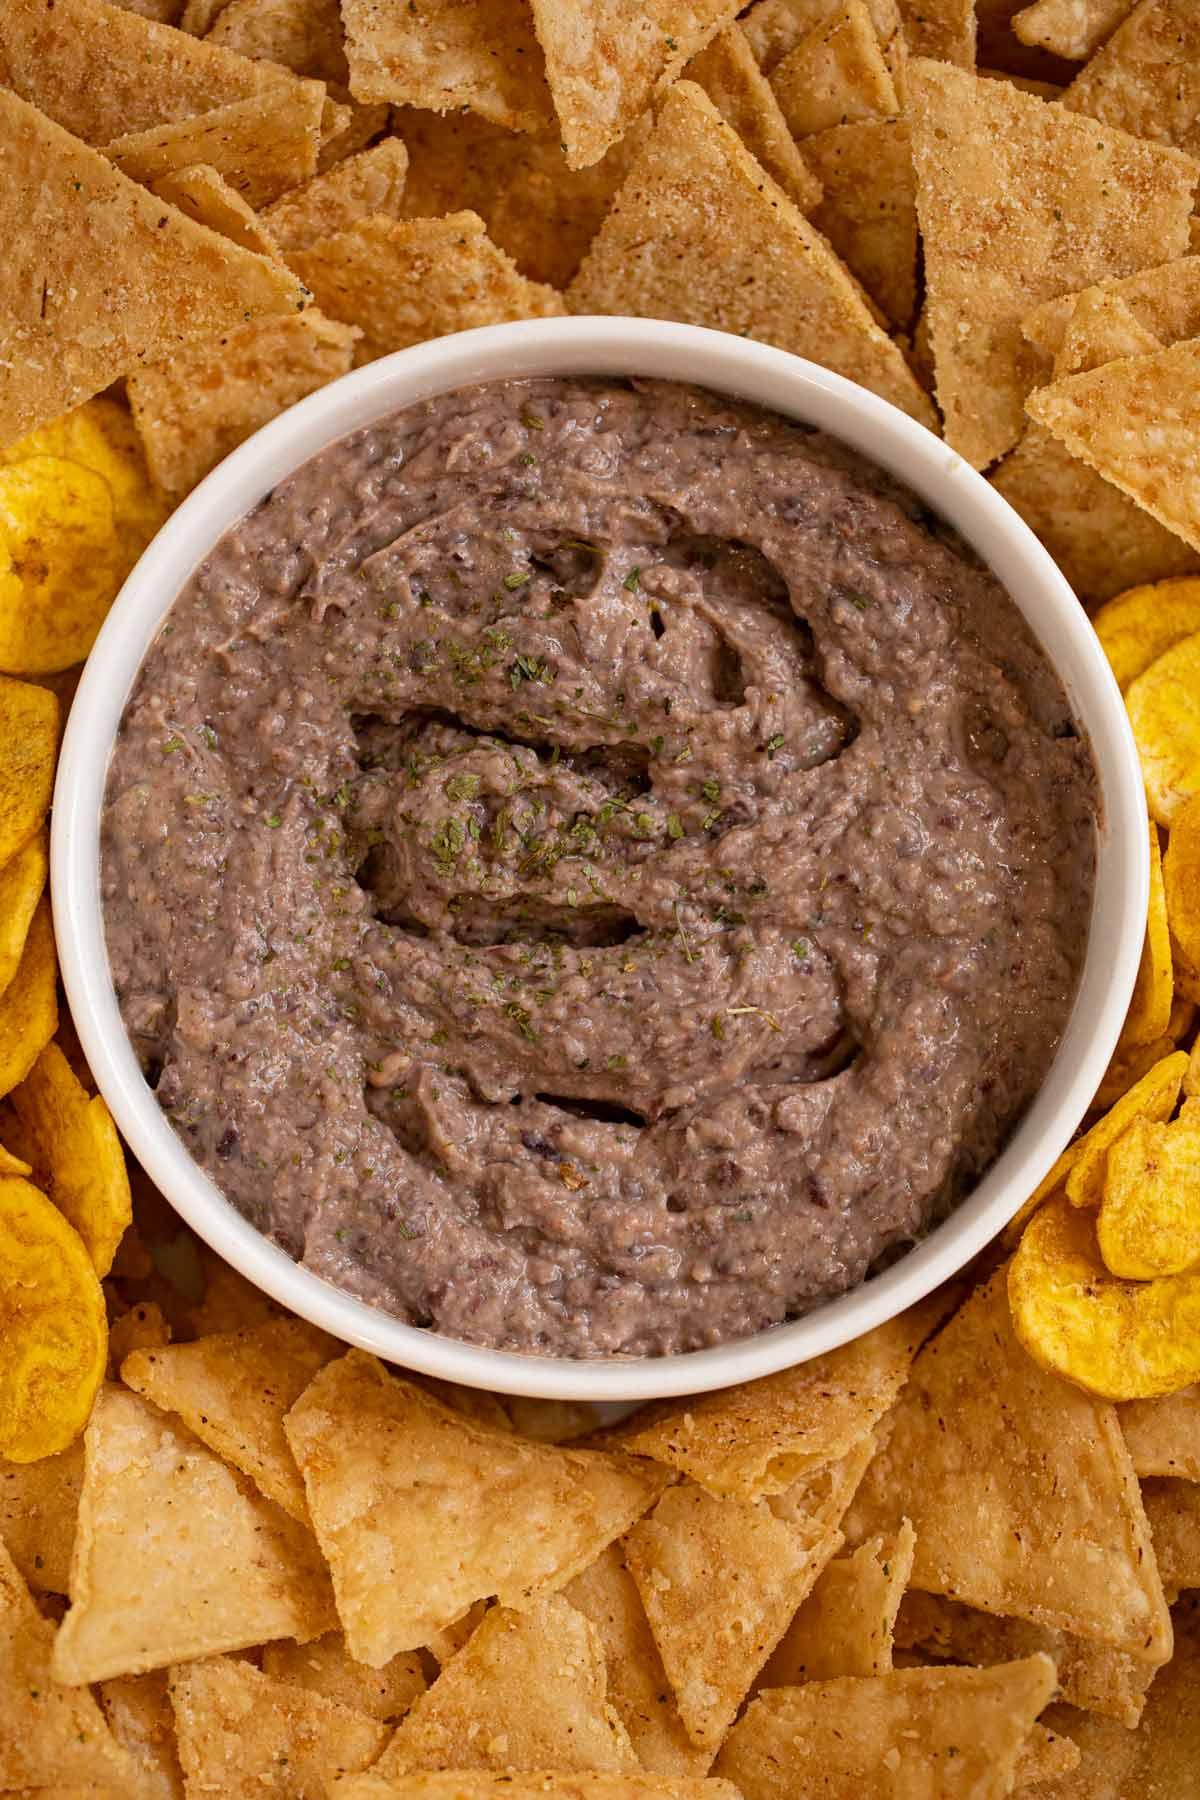 Greek Yogurt Black Bean Dip on serving tray with chips